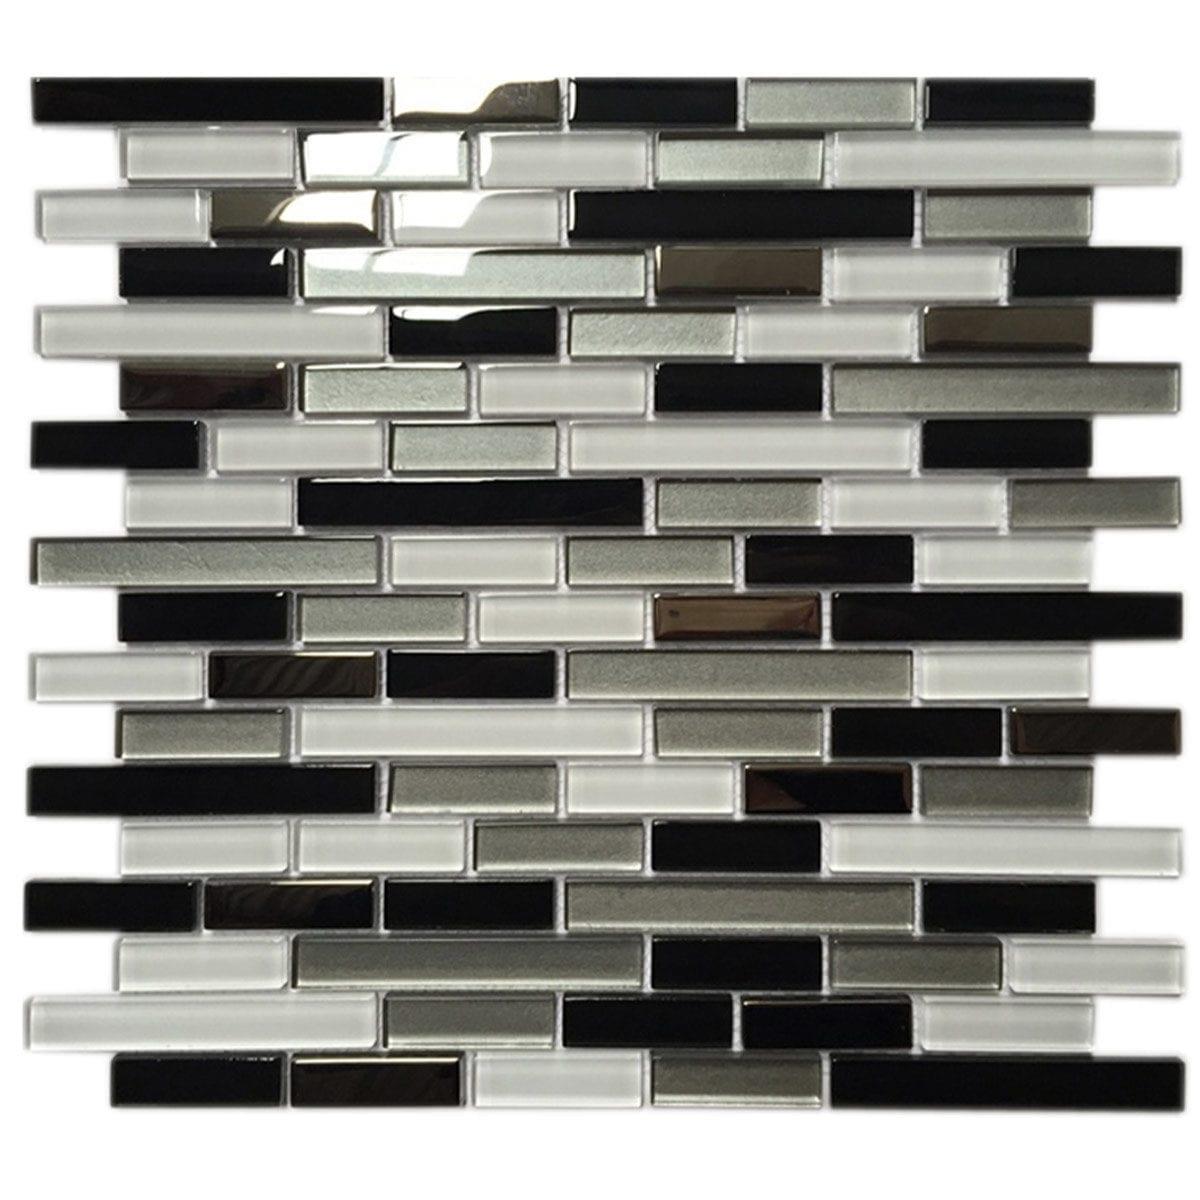 M4T031 1 Brick pattern White grey black metalic finish COVER